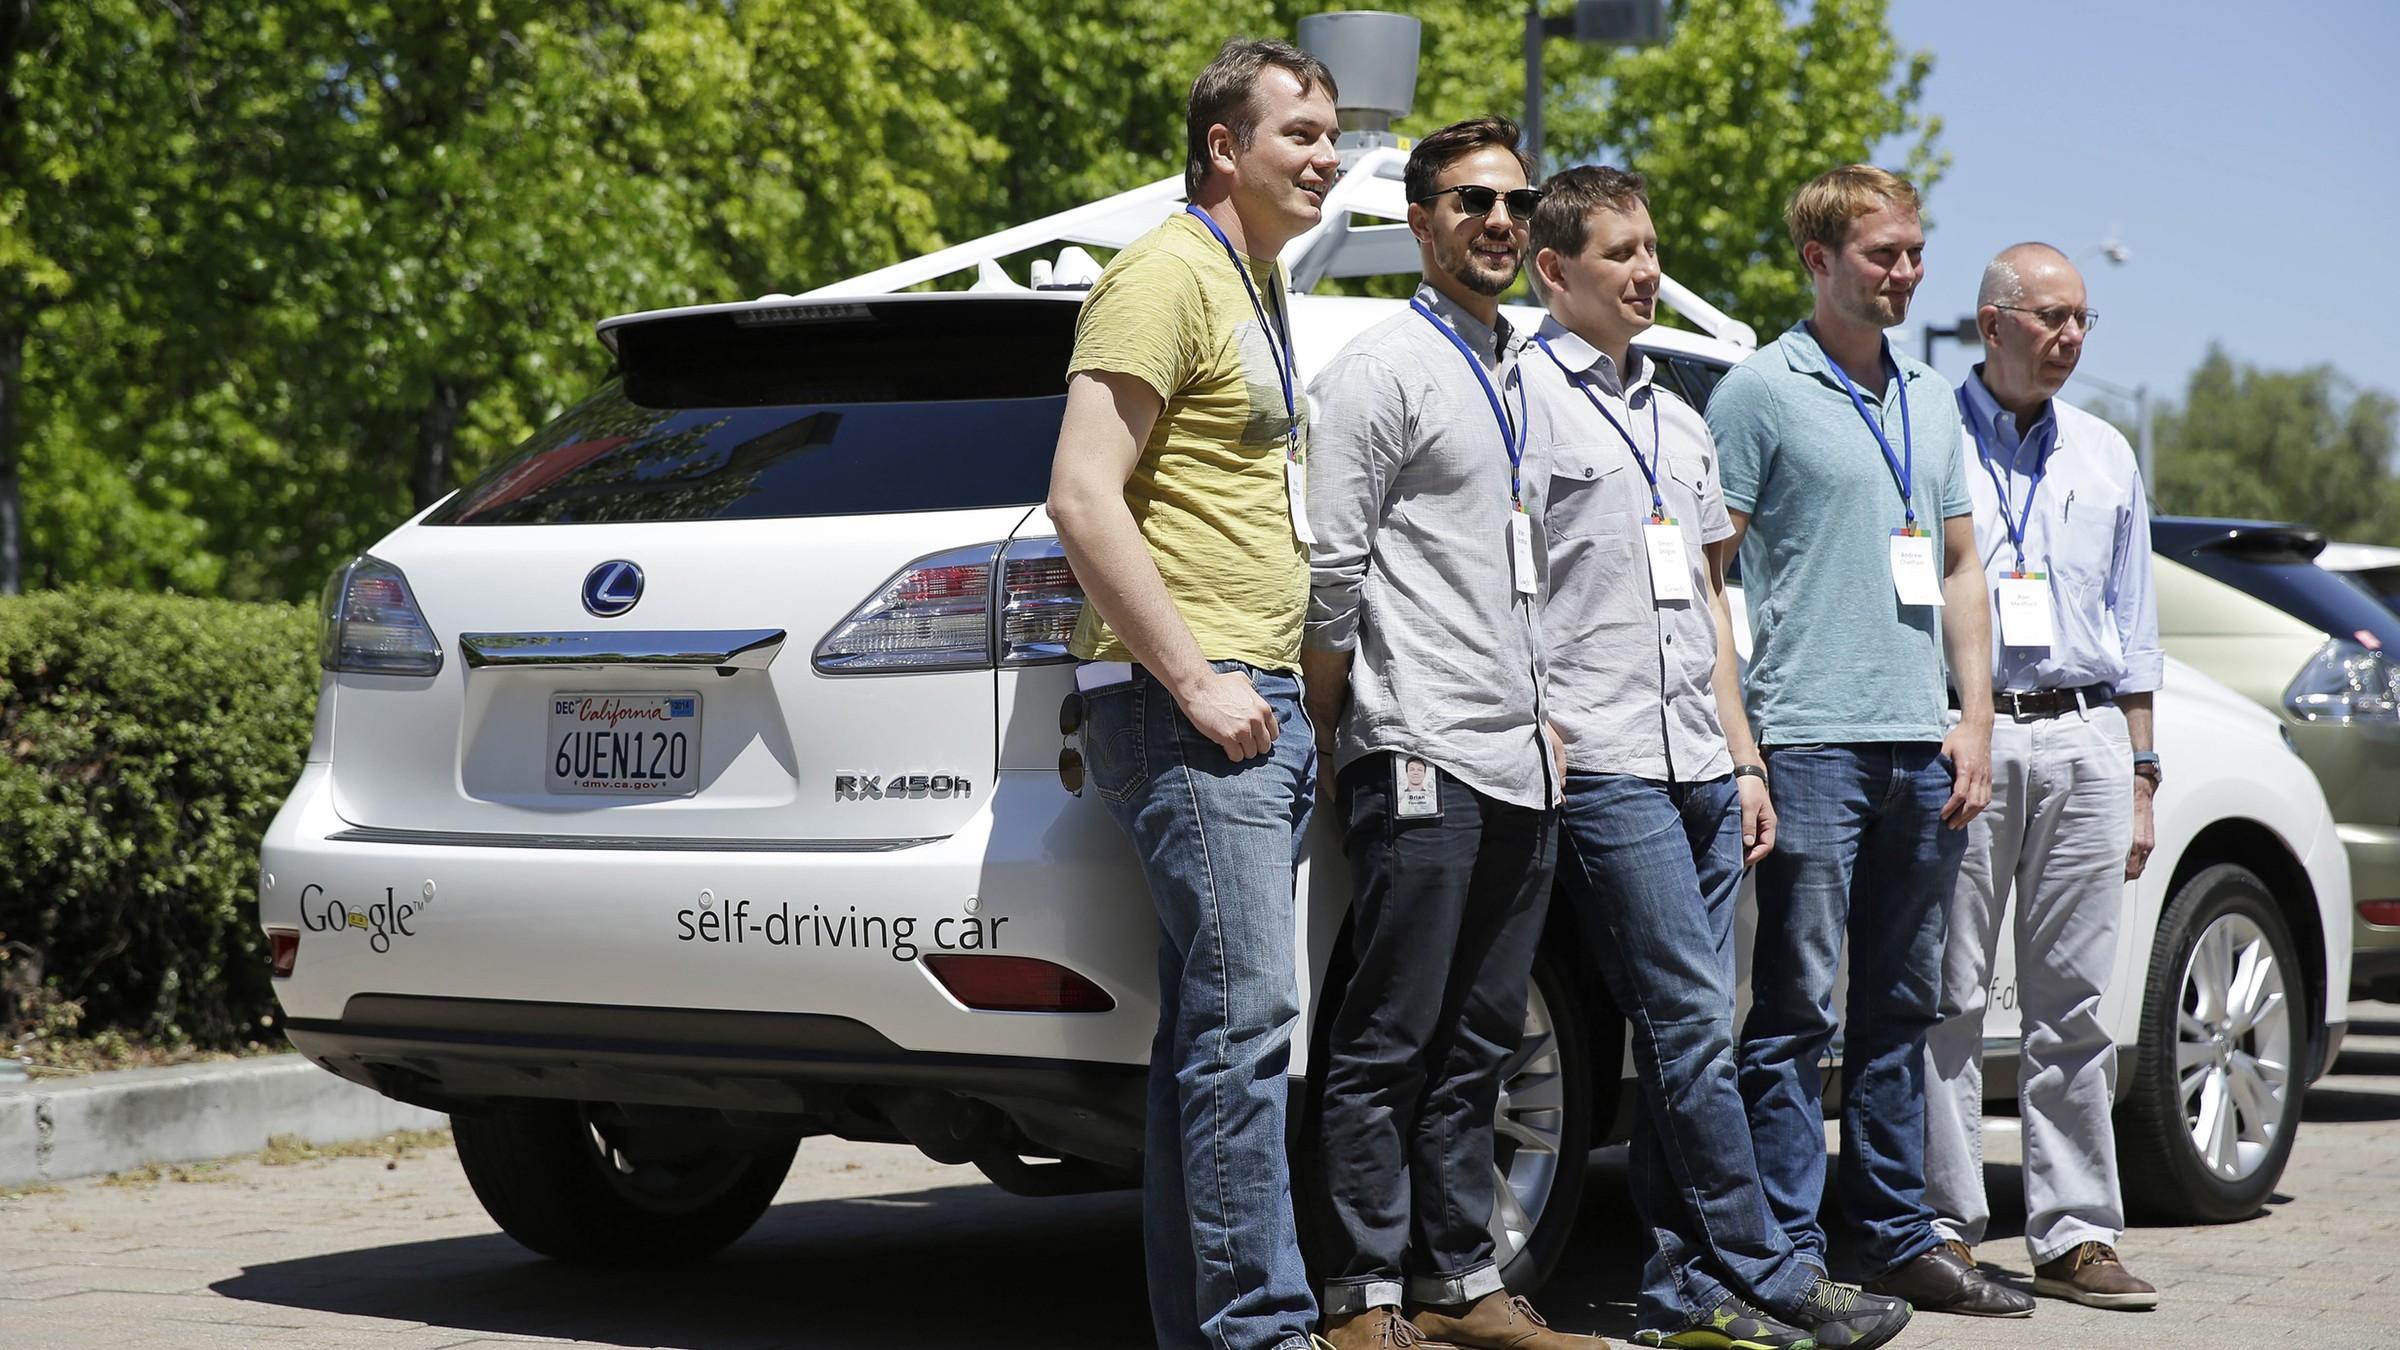 Google self-driving car team